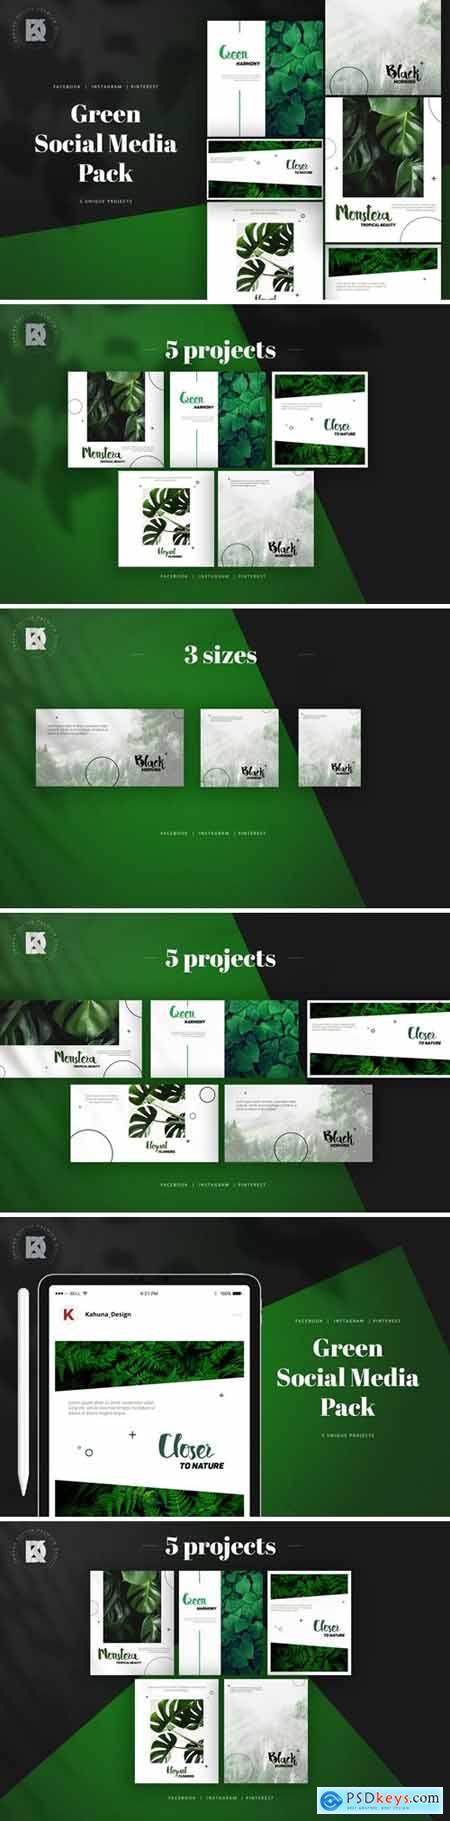 Green Banners Social Media Pack